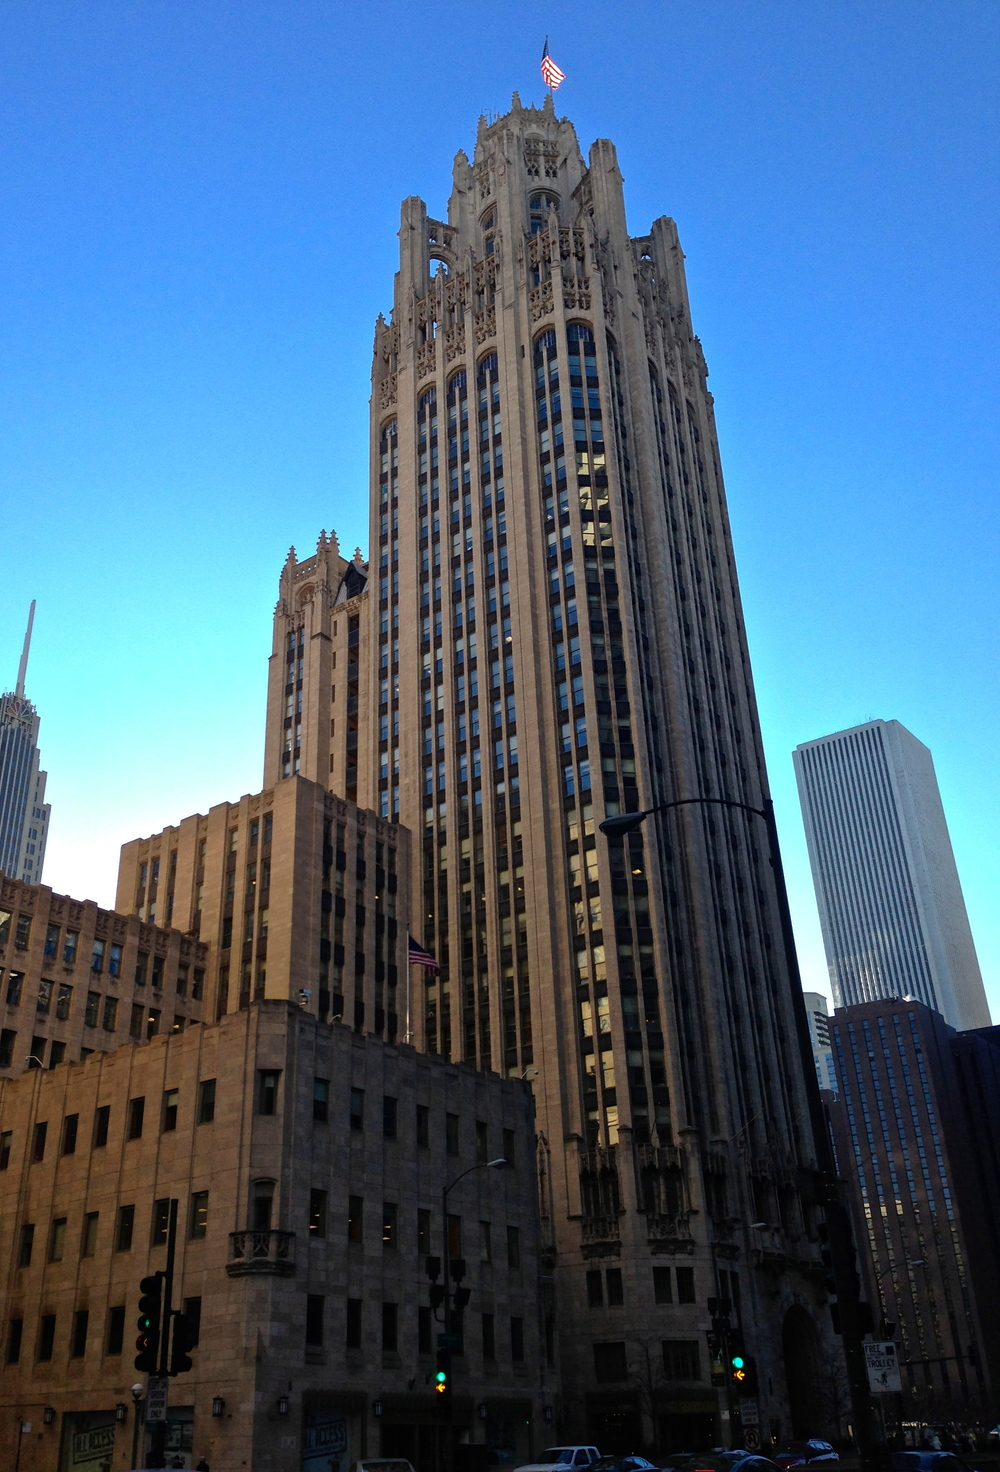 The 1925 Tribune Tower